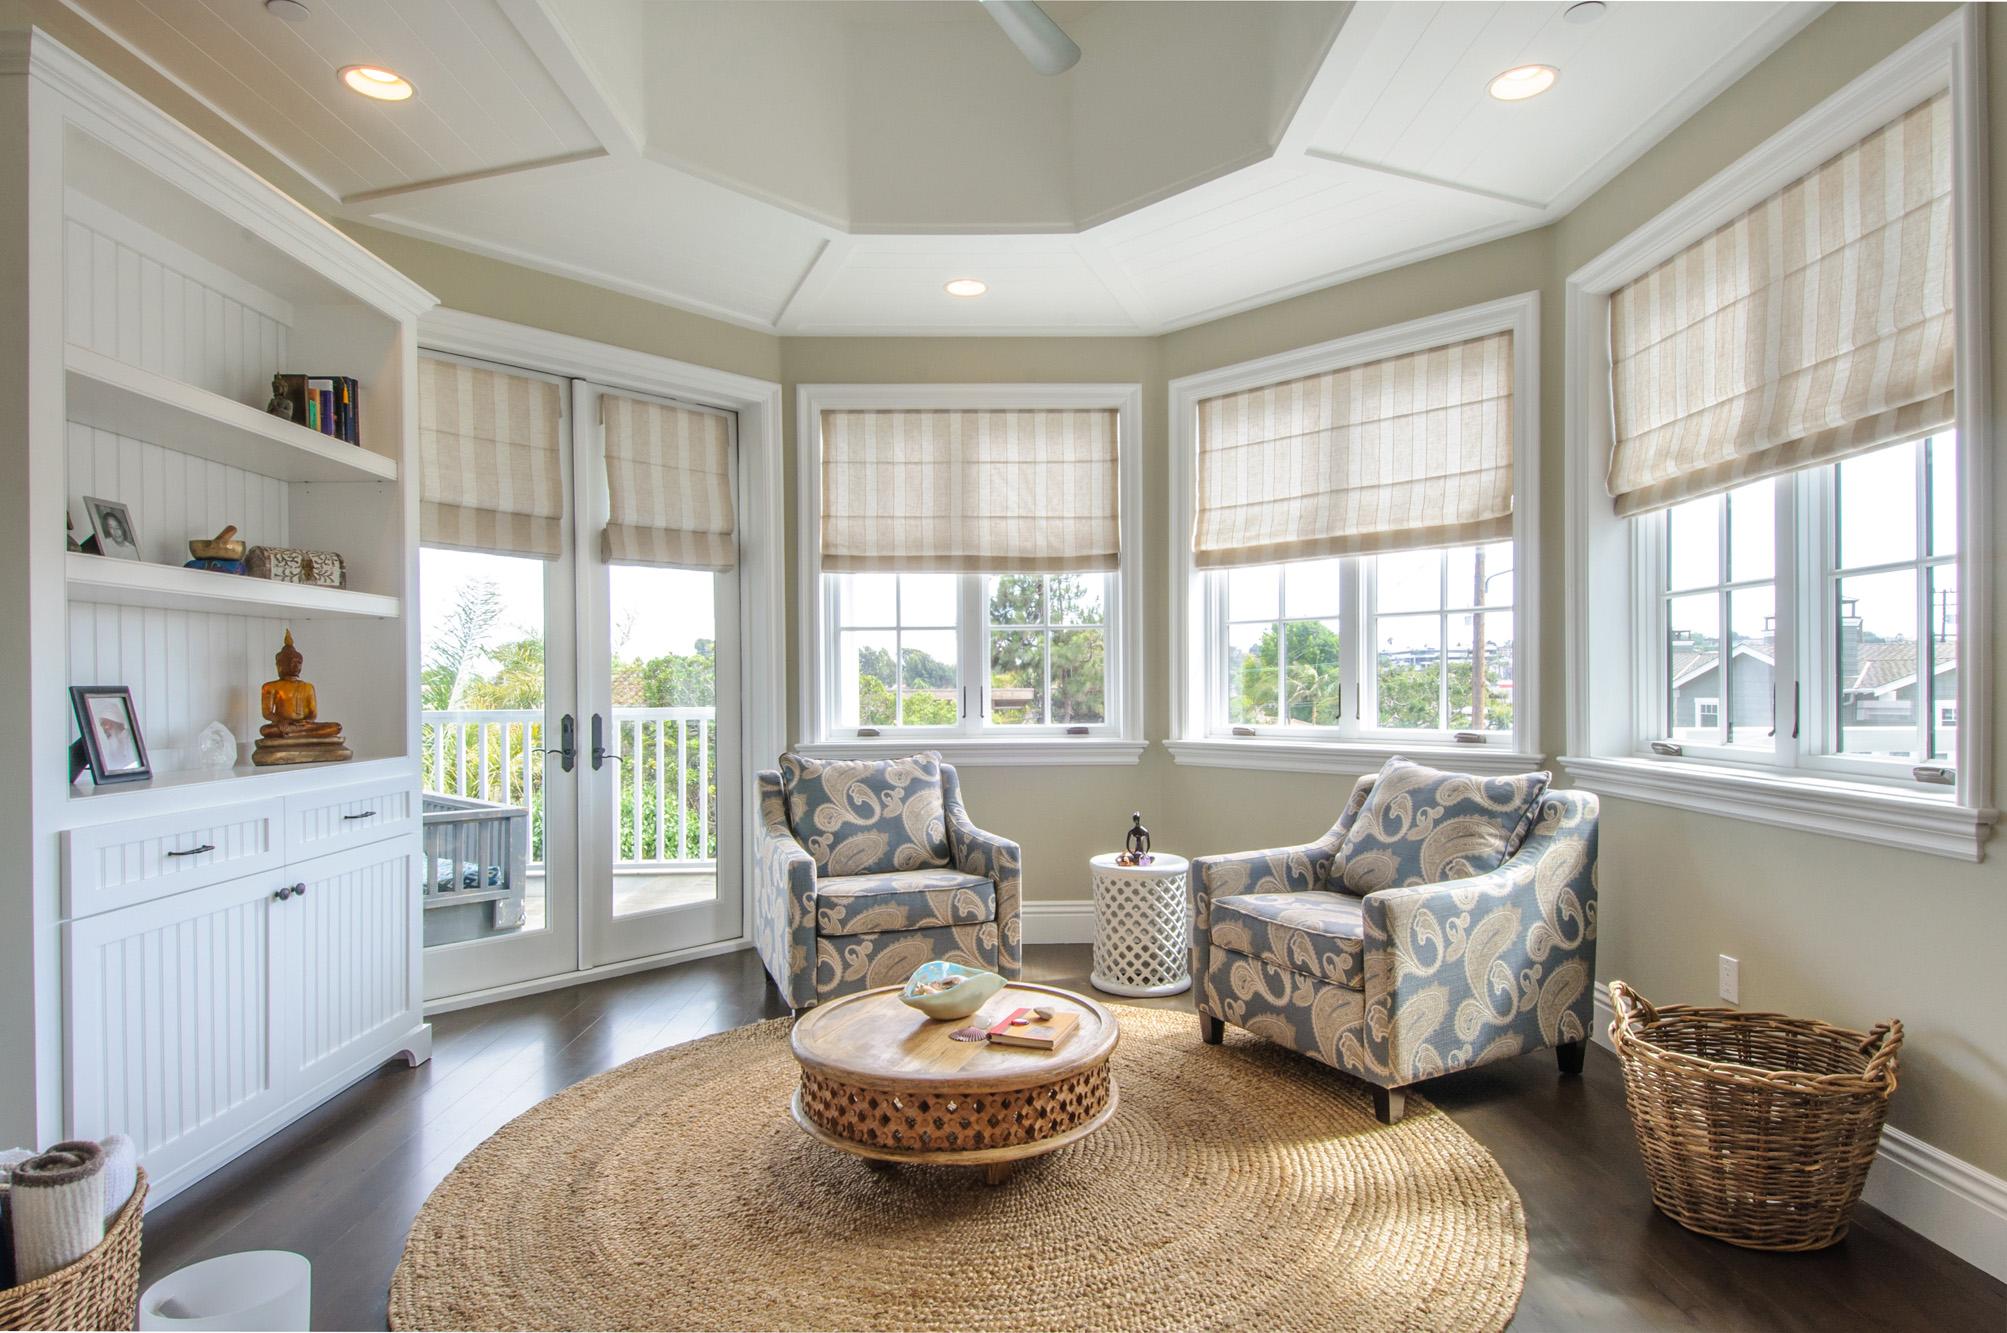 capecod - round sitting room.jpg